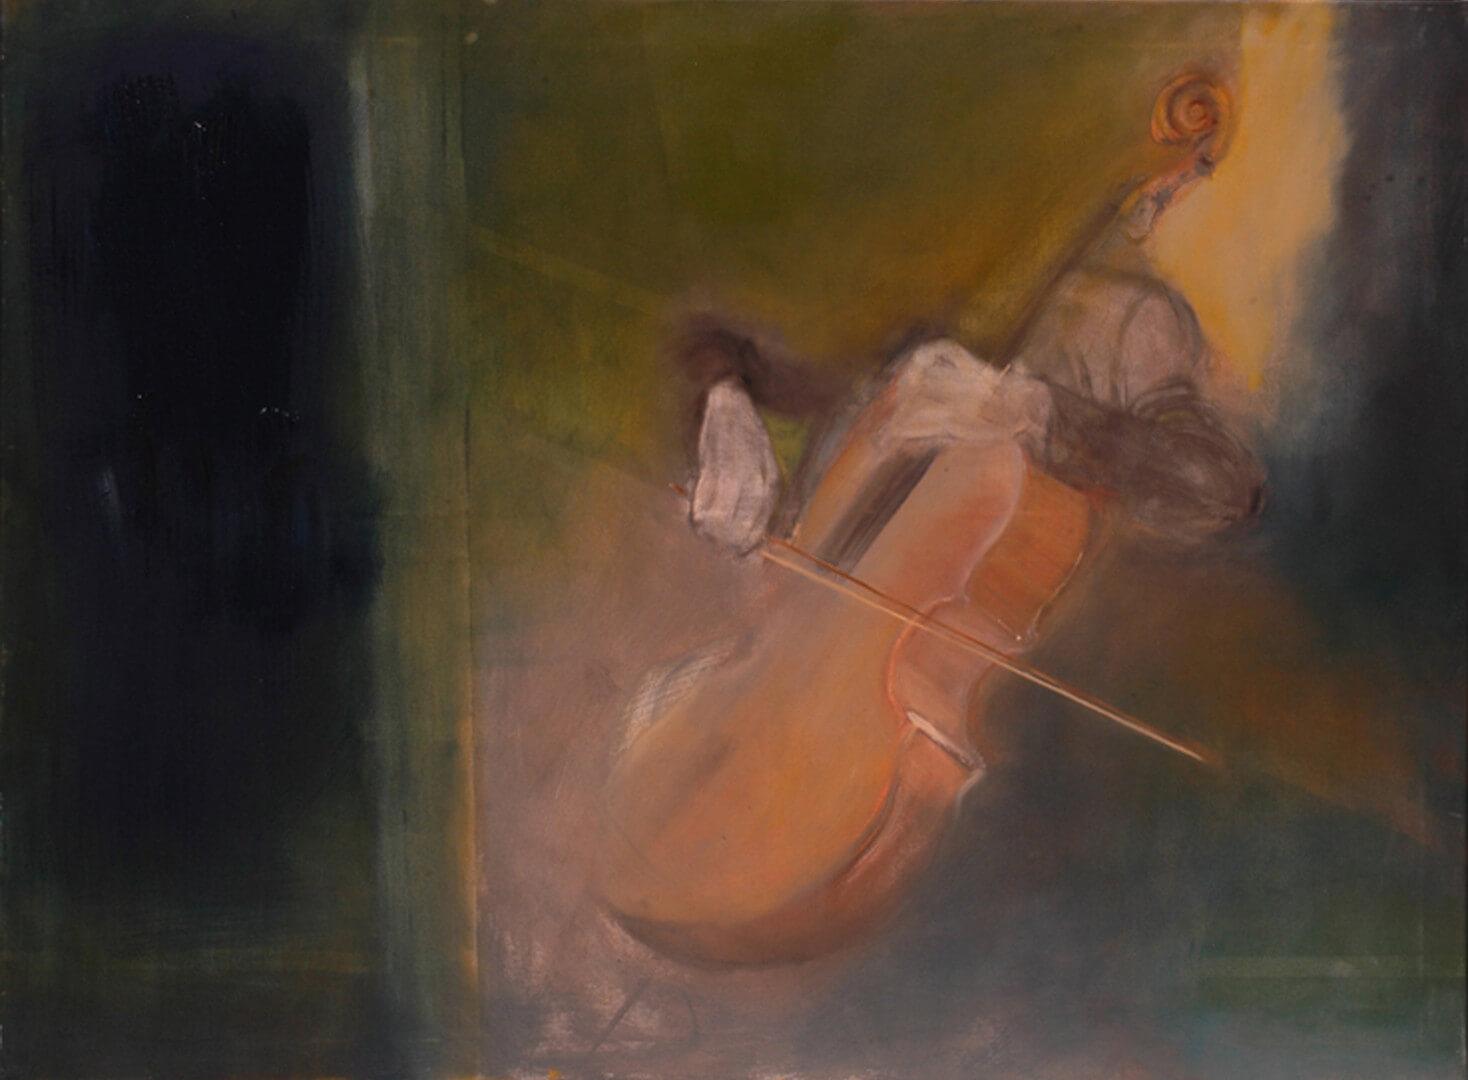 2006 - Oil on canvas. 97 cm. x 129 cm.